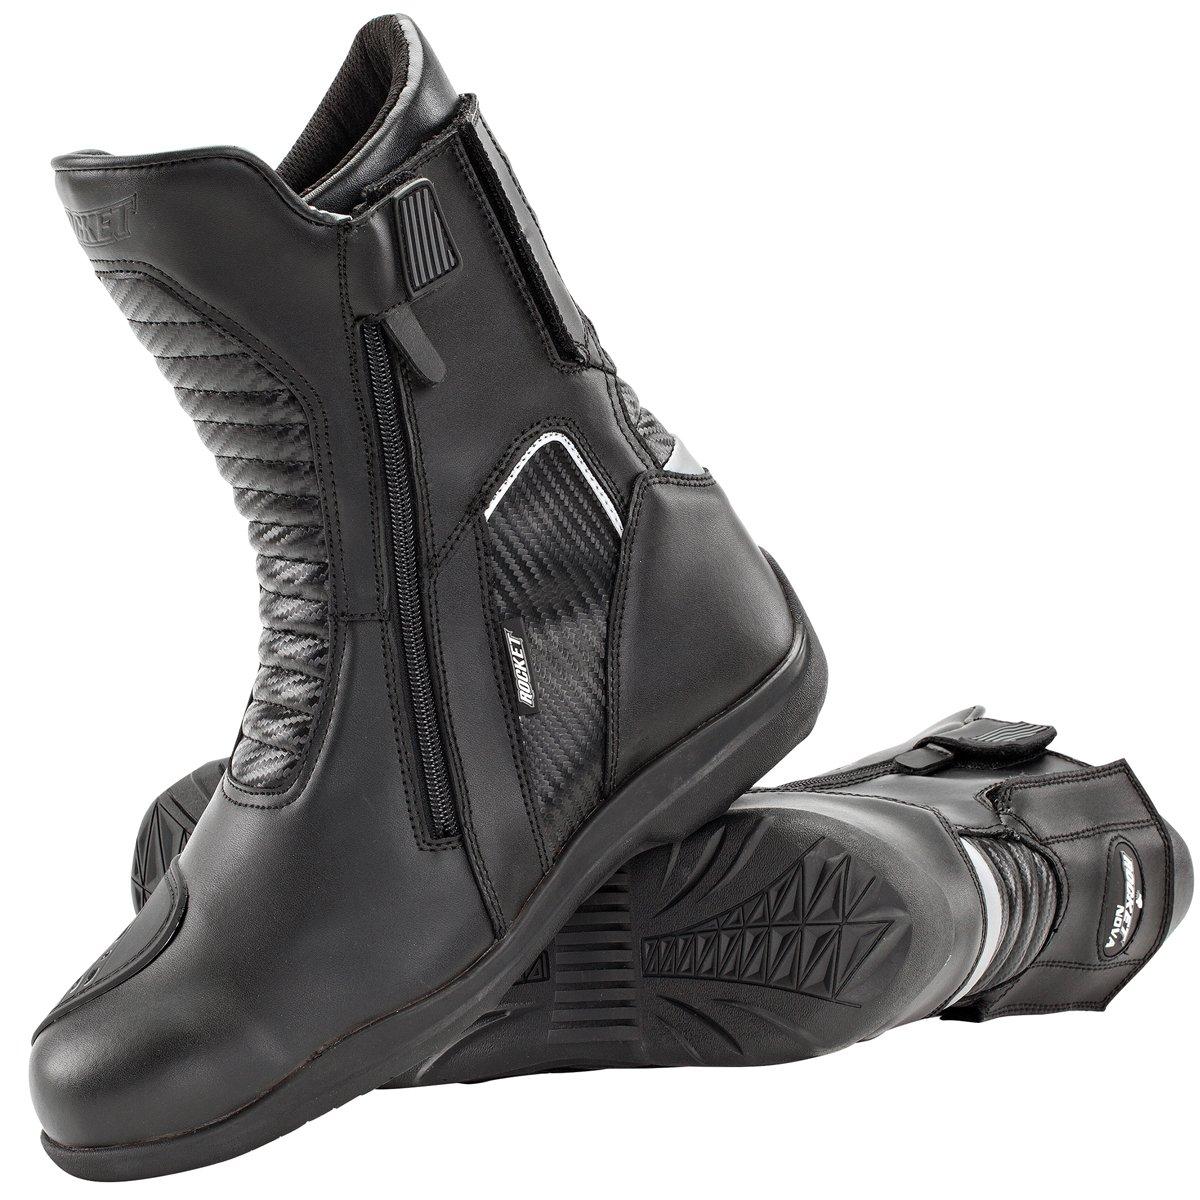 Joe Rocket Men's Nova Leather Boots (Black, Size 11)